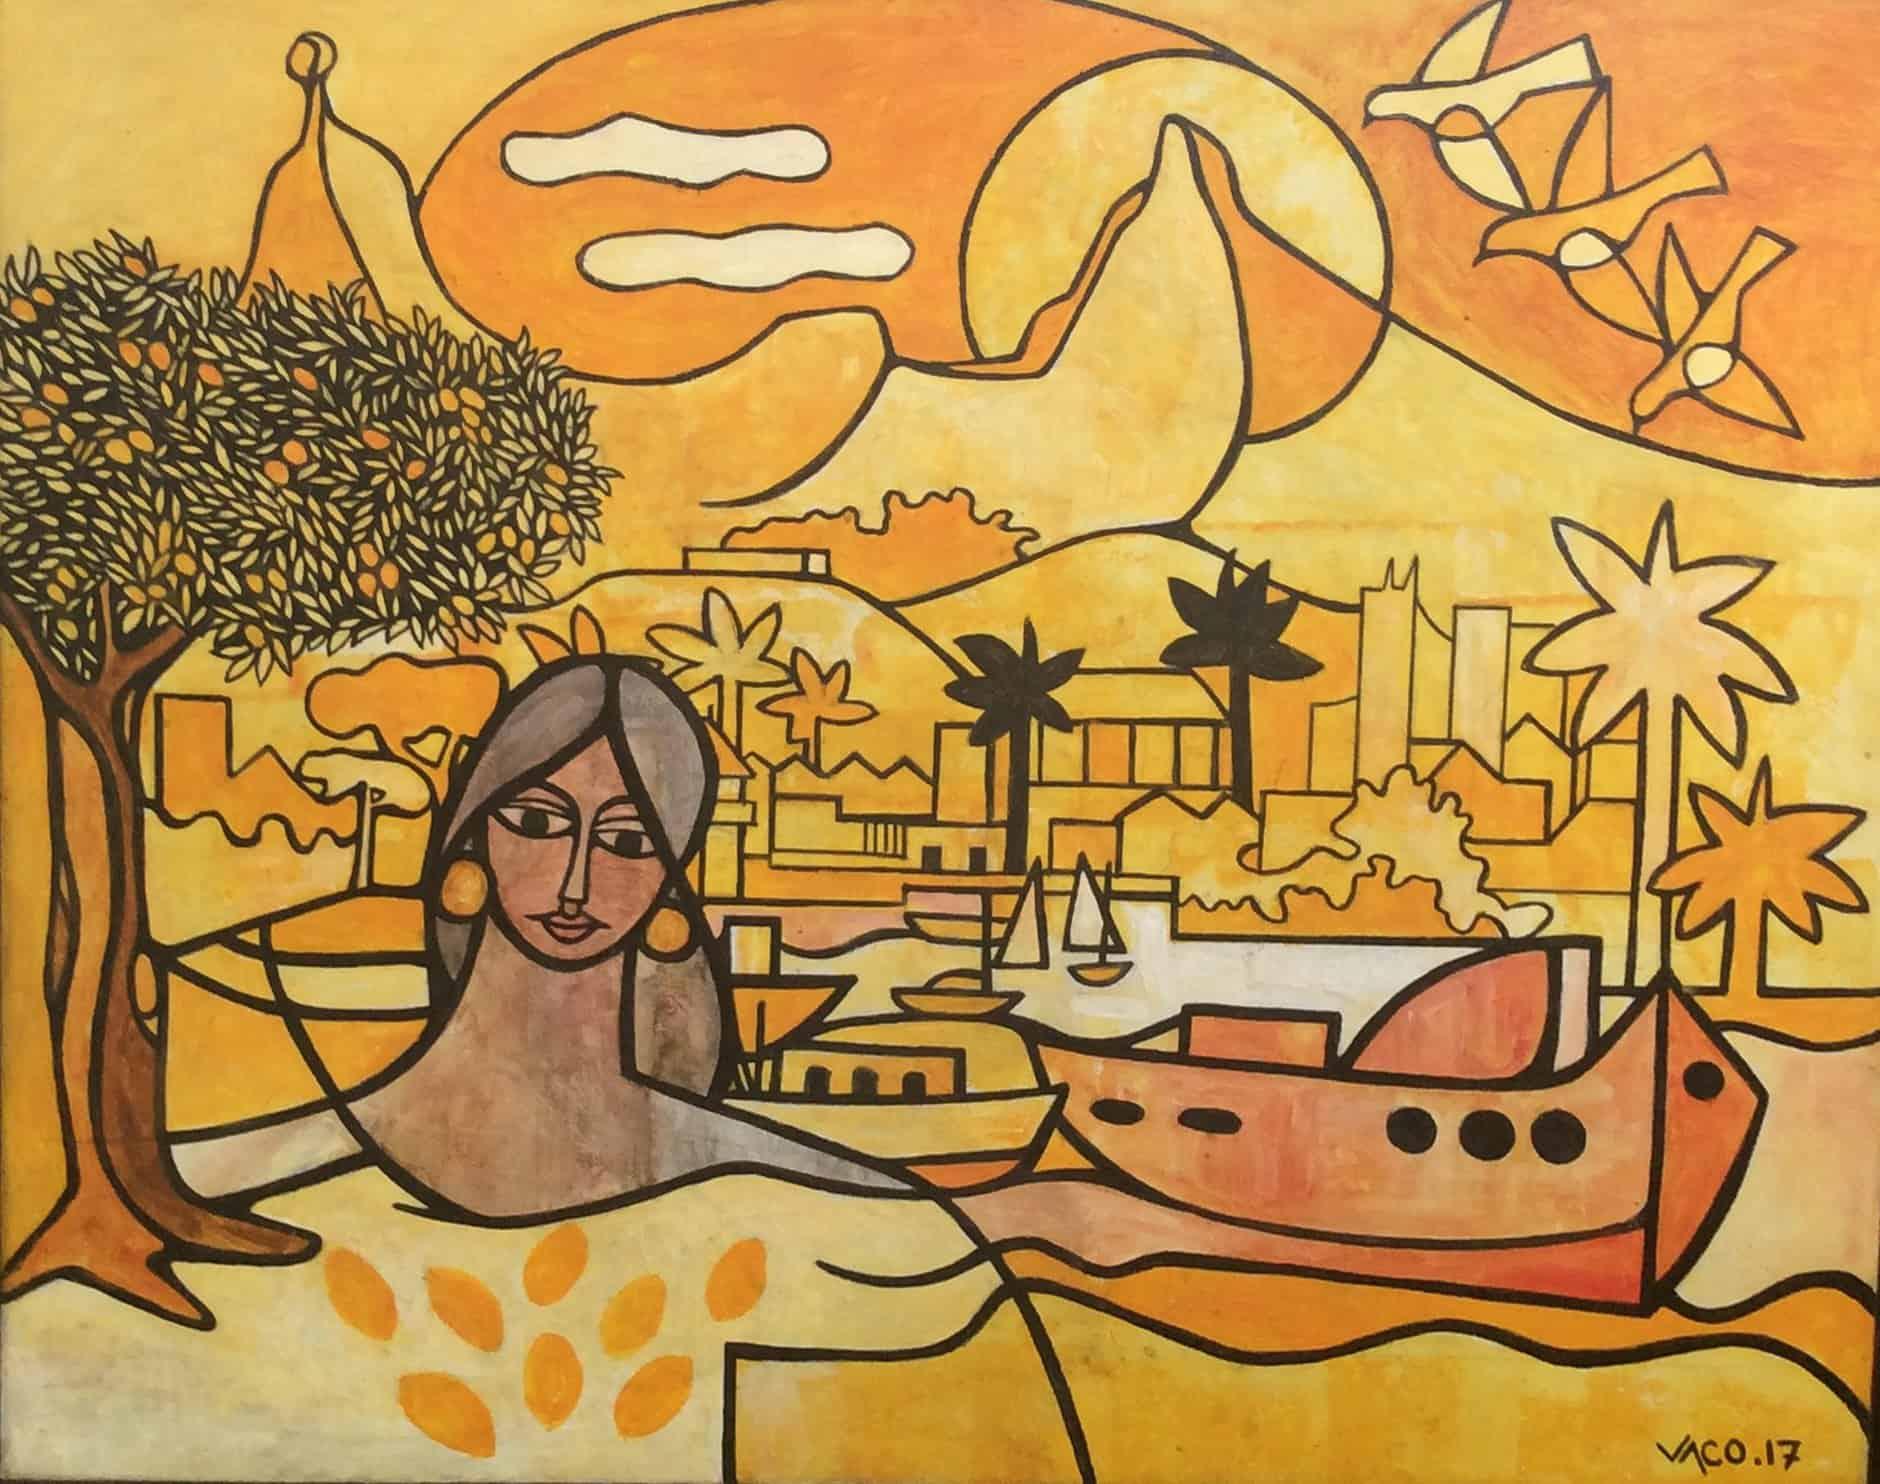 mauritius_arts_vaco_baissac_port_louis